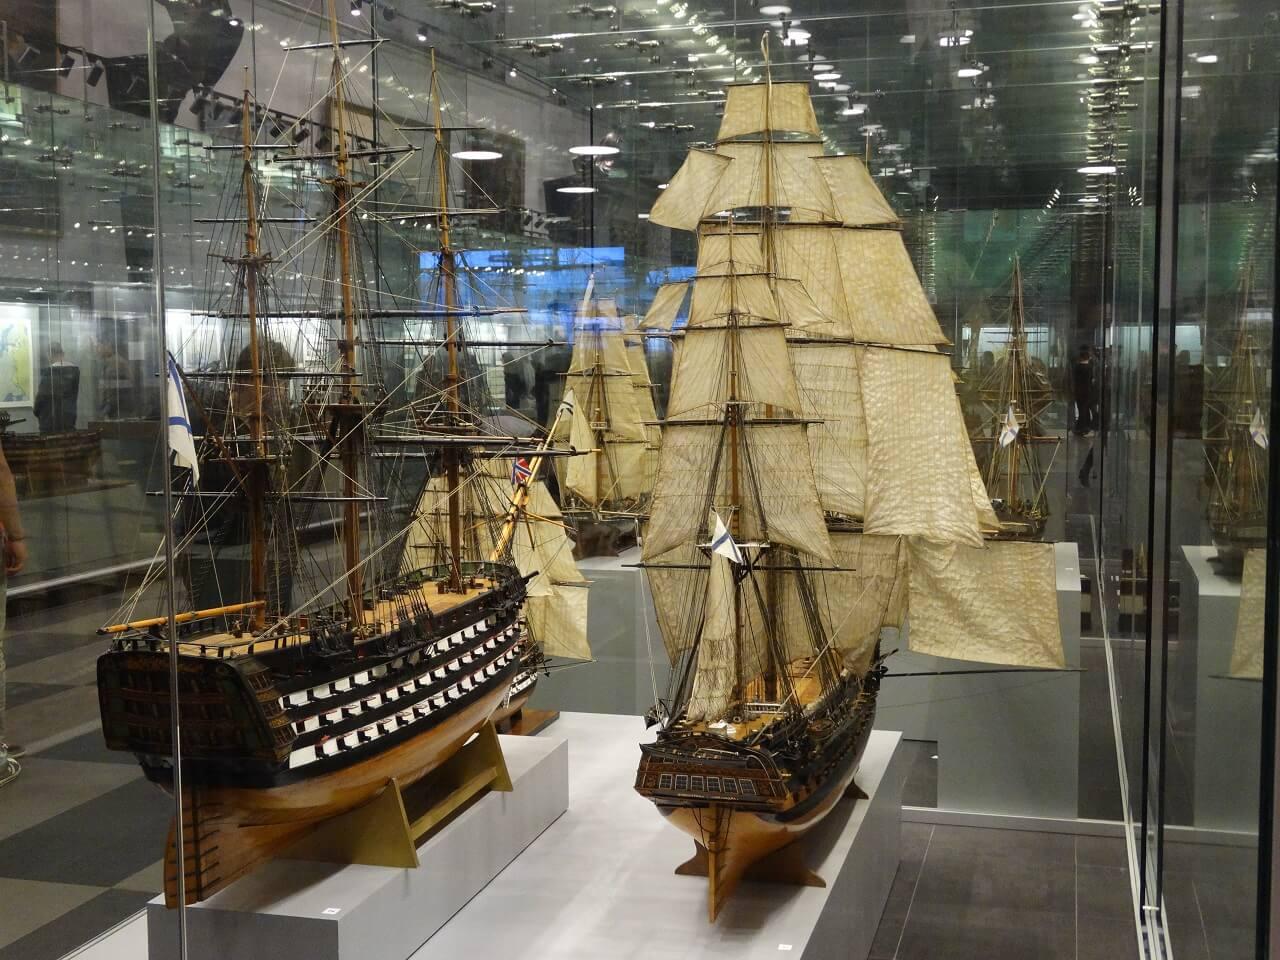 2 Miniture model ships